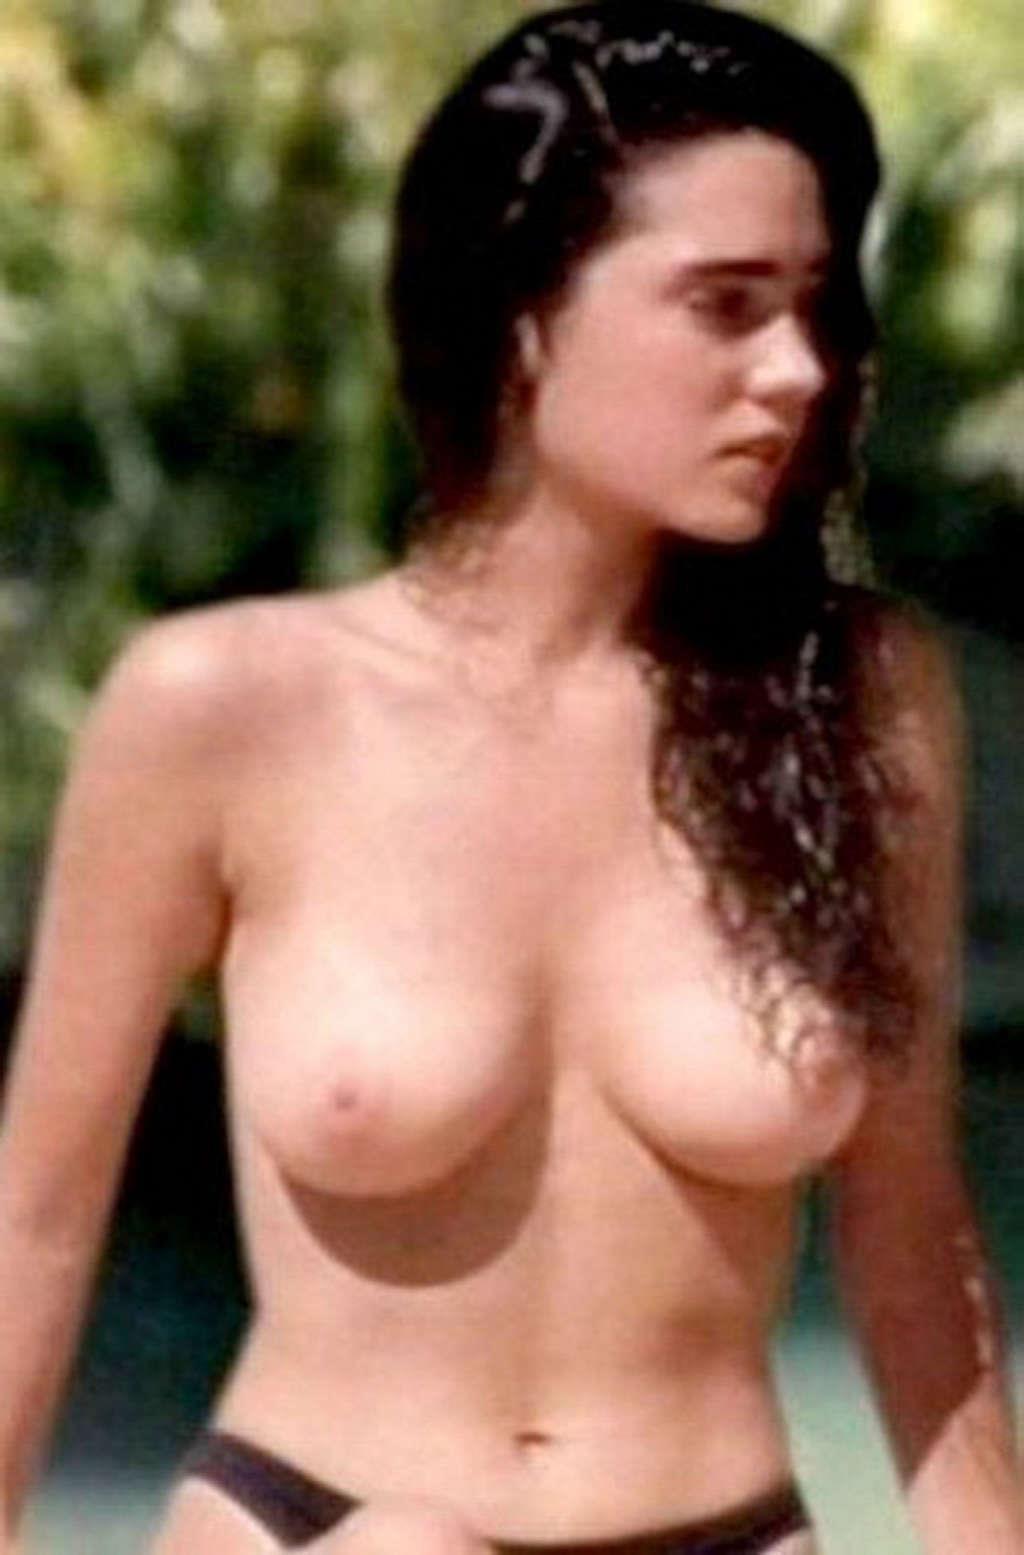 adrienne-jennifer-connelly-tits-free-vids-fuck-video-hand